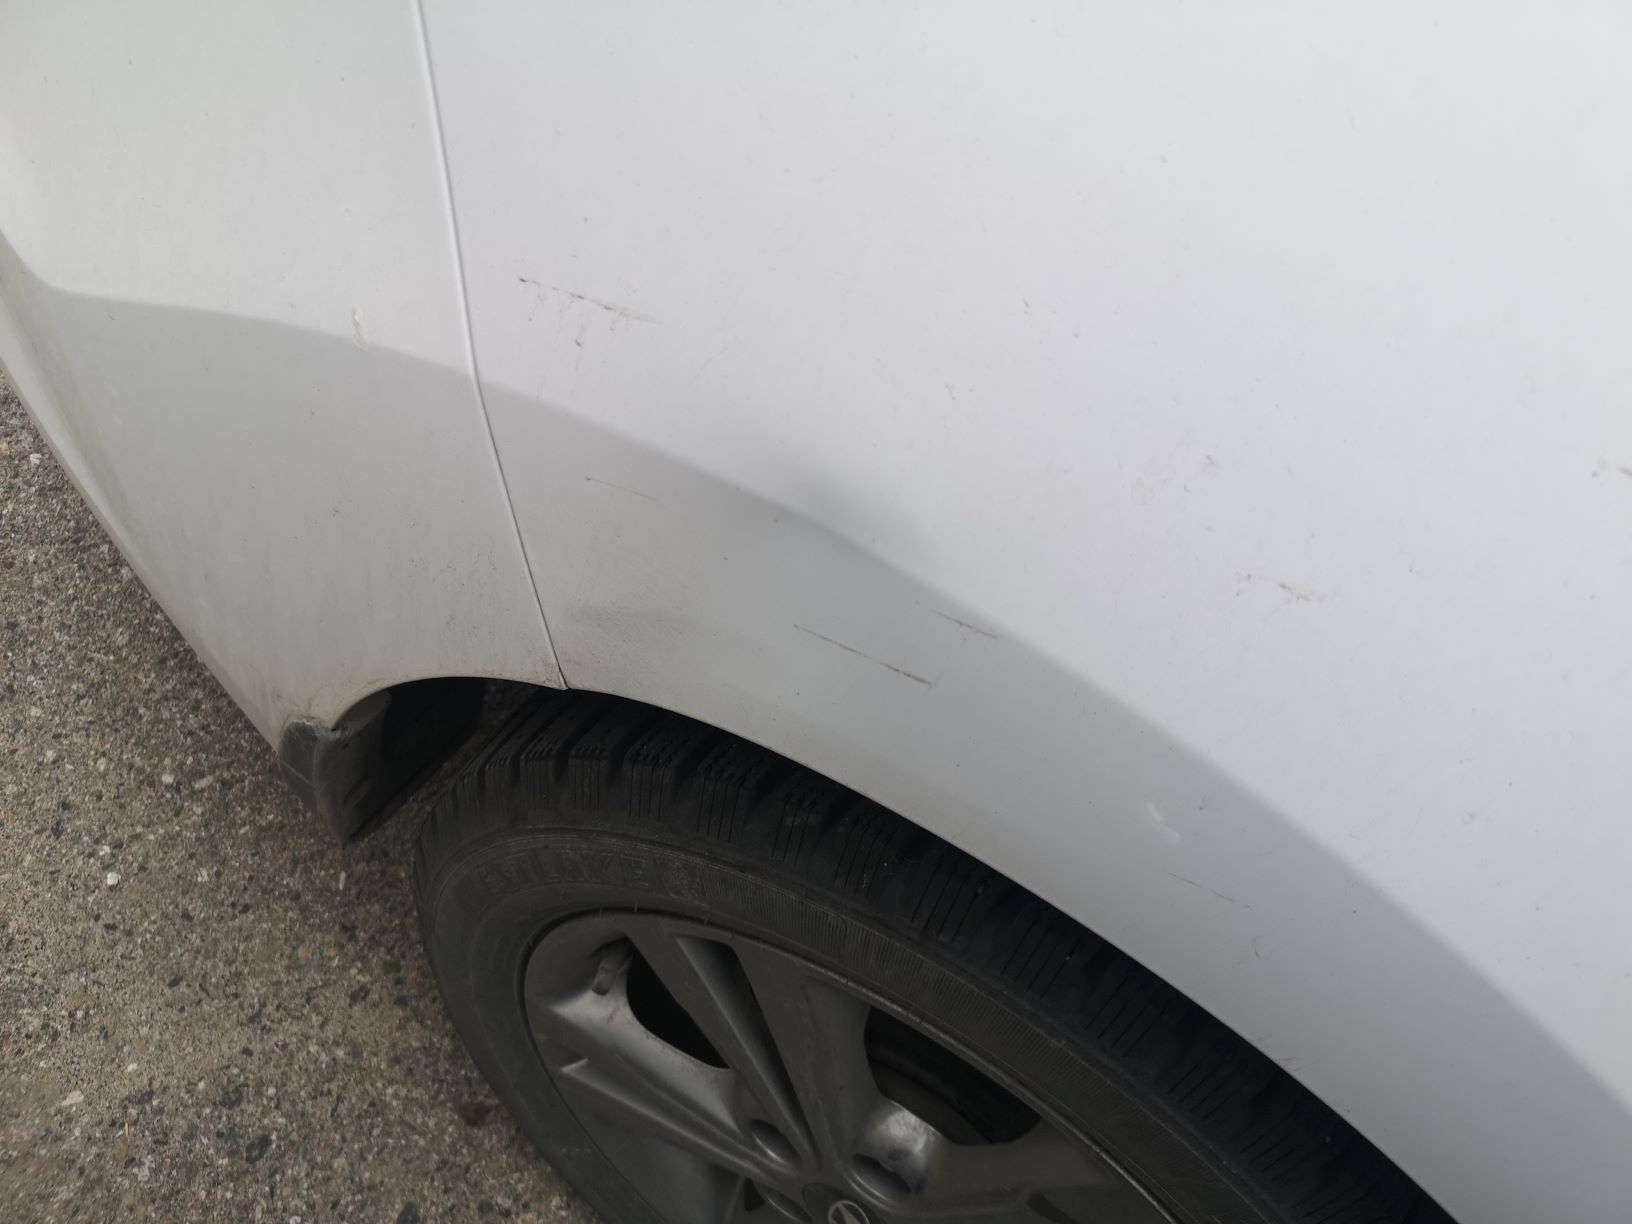 2017 Hyundai Elantra GLS  ID#B-KEL-0356 Located in Kelowna